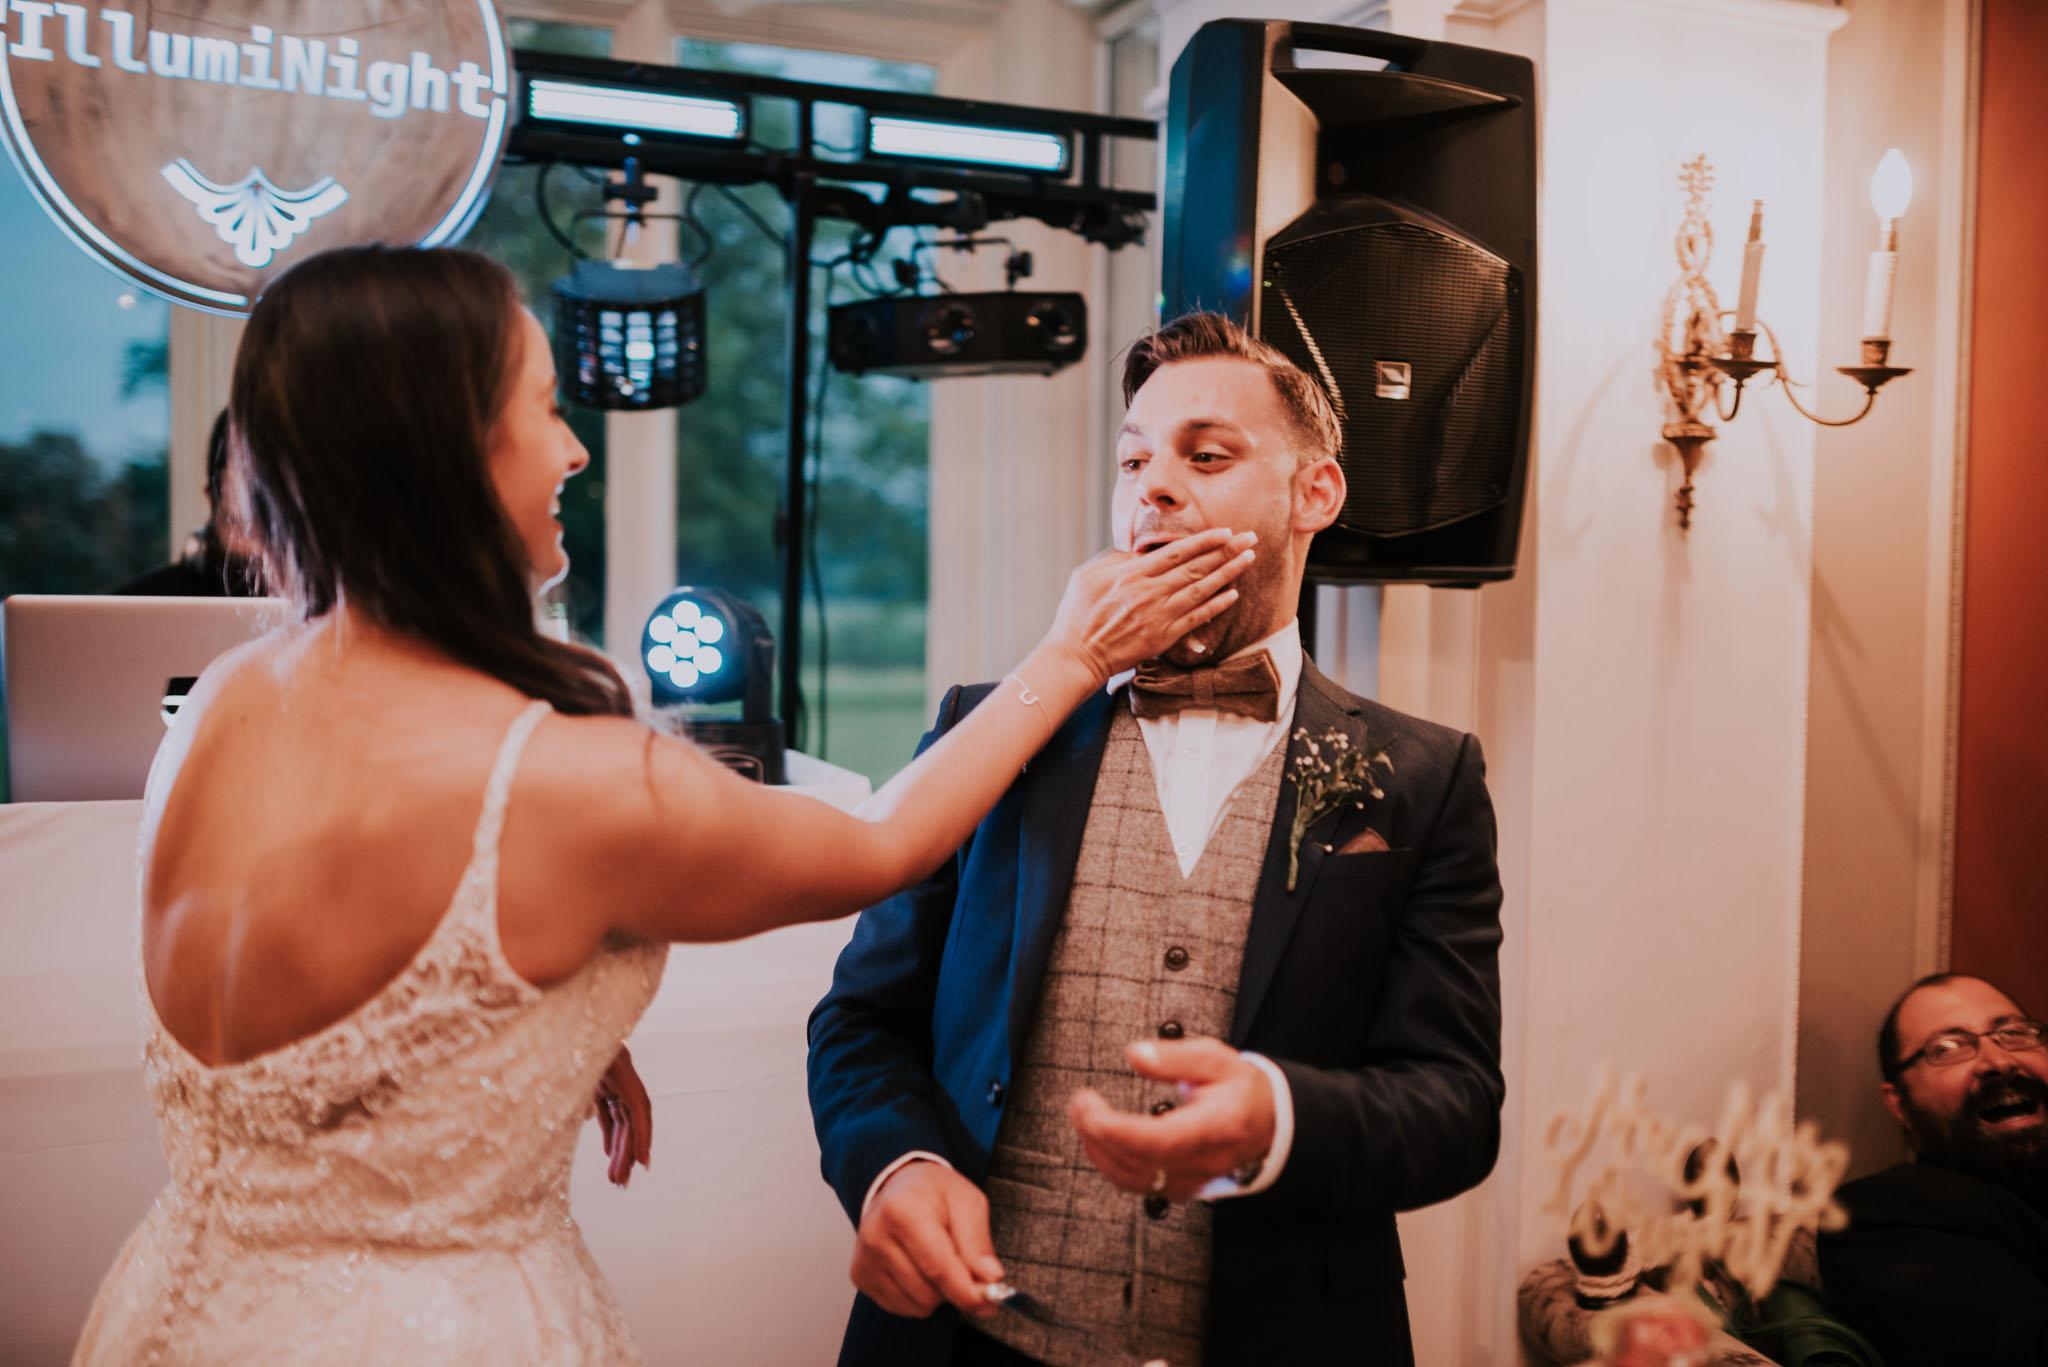 wedding-photographer-glewstone-court-hereford-scott-stockwell-photography481.jpg